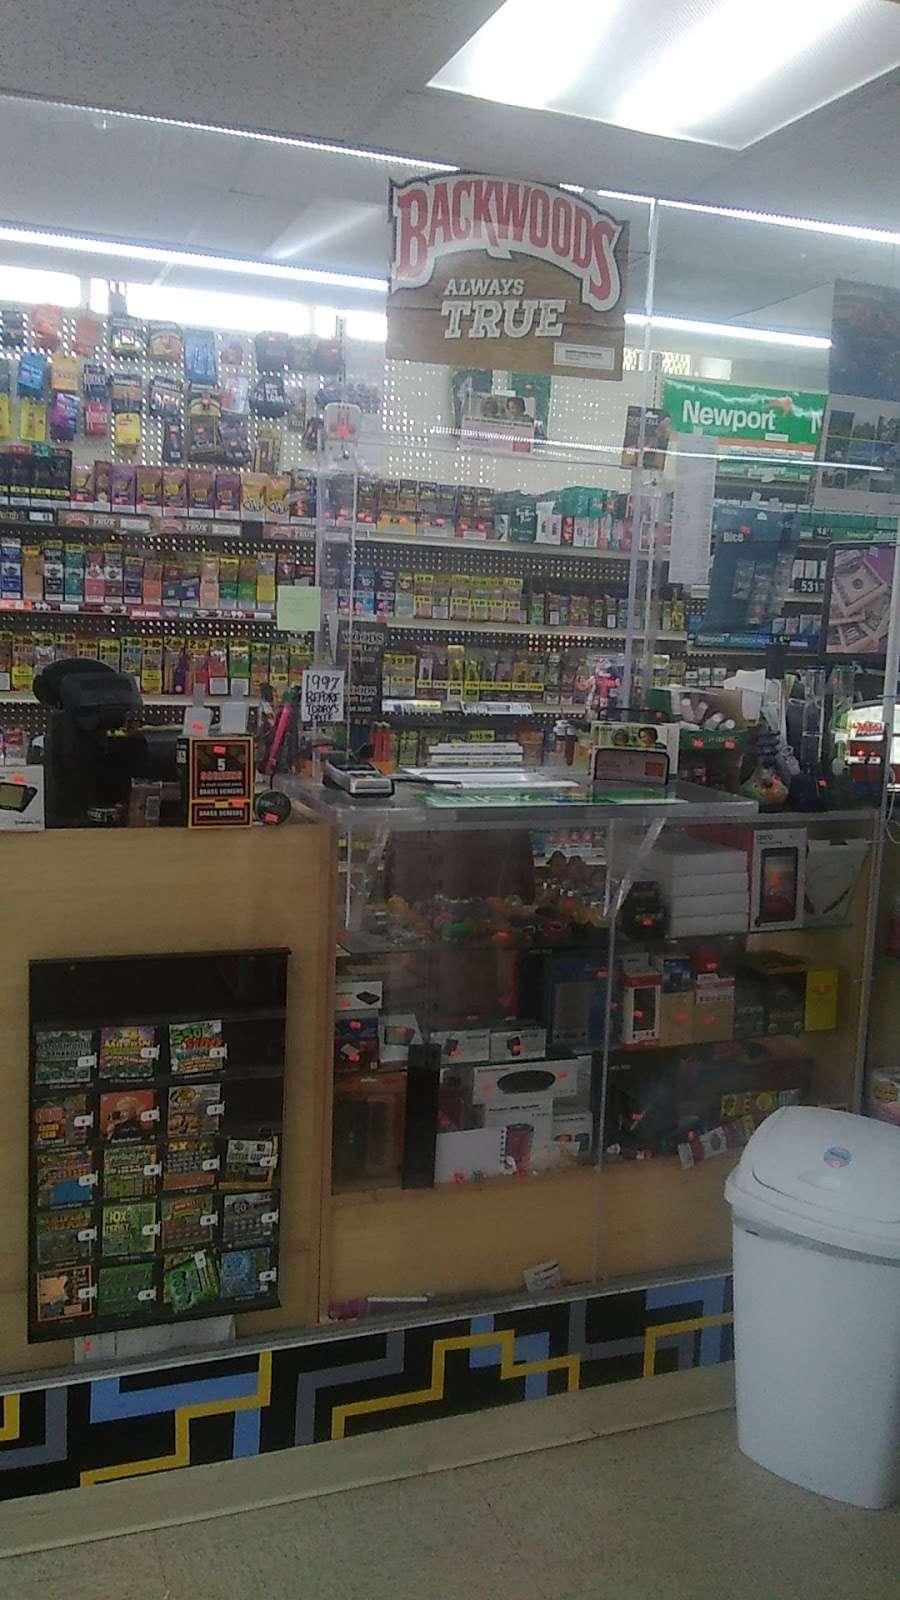 Neighborhood Market - store  | Photo 1 of 4 | Address: 3800 E 39th St, Kansas City, MO 64128, USA